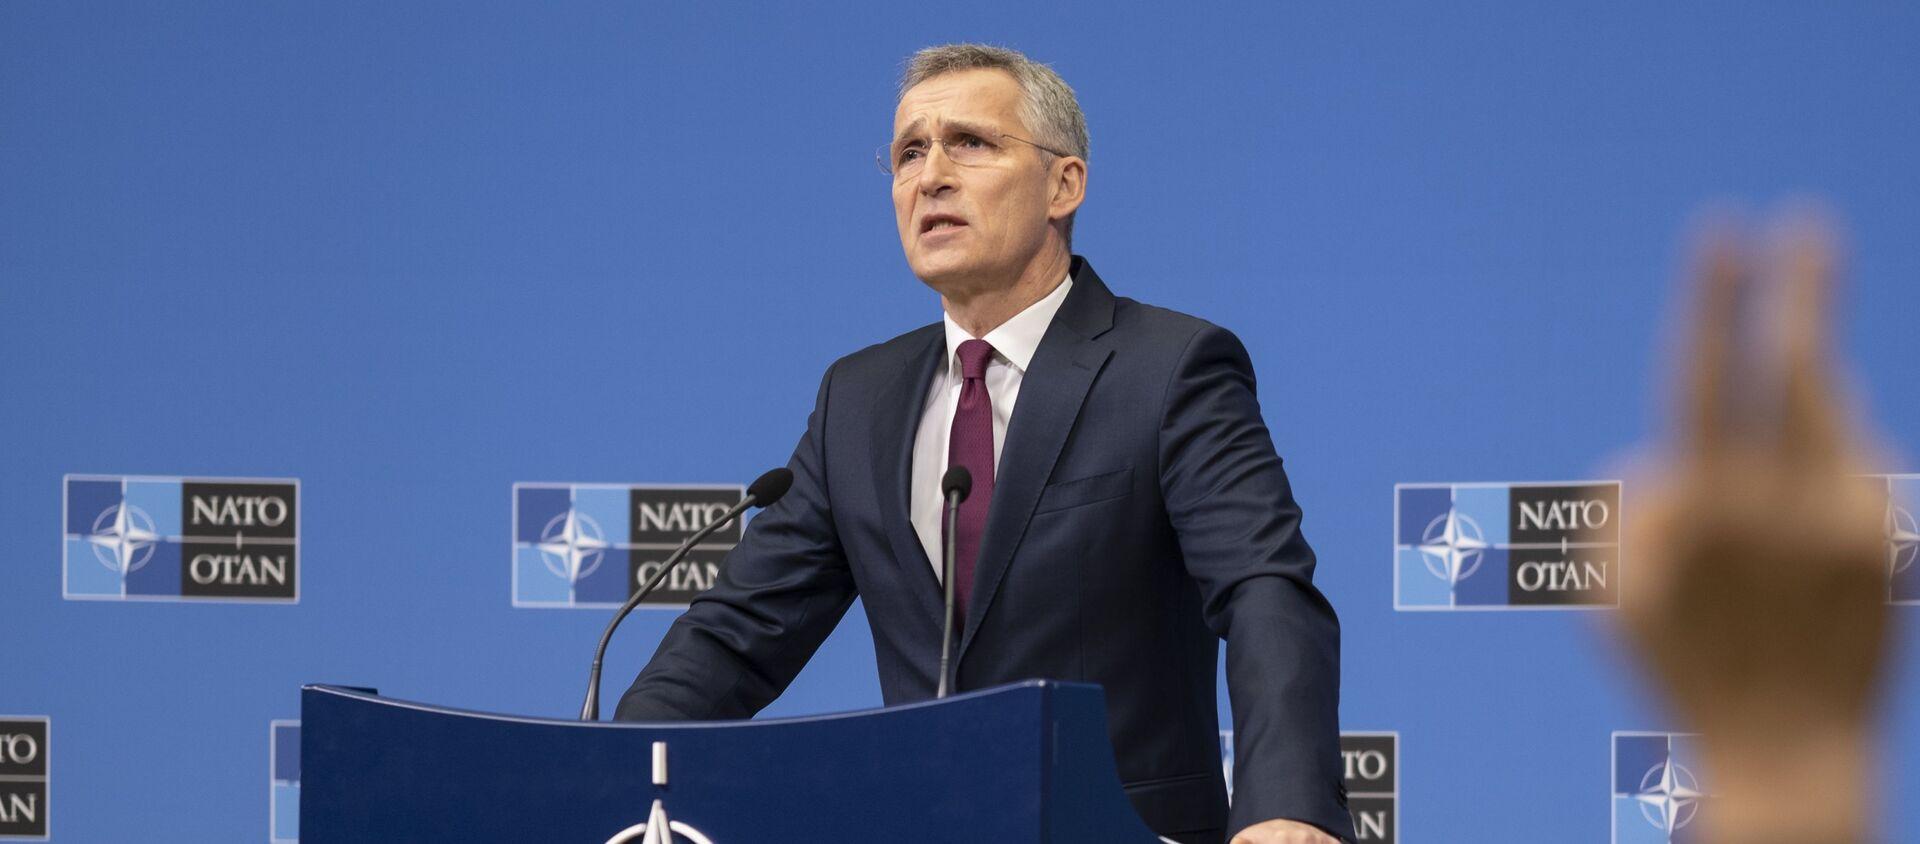 Генерални секретар НАТО Јенс Столтенберг - Sputnik Србија, 1920, 27.05.2021